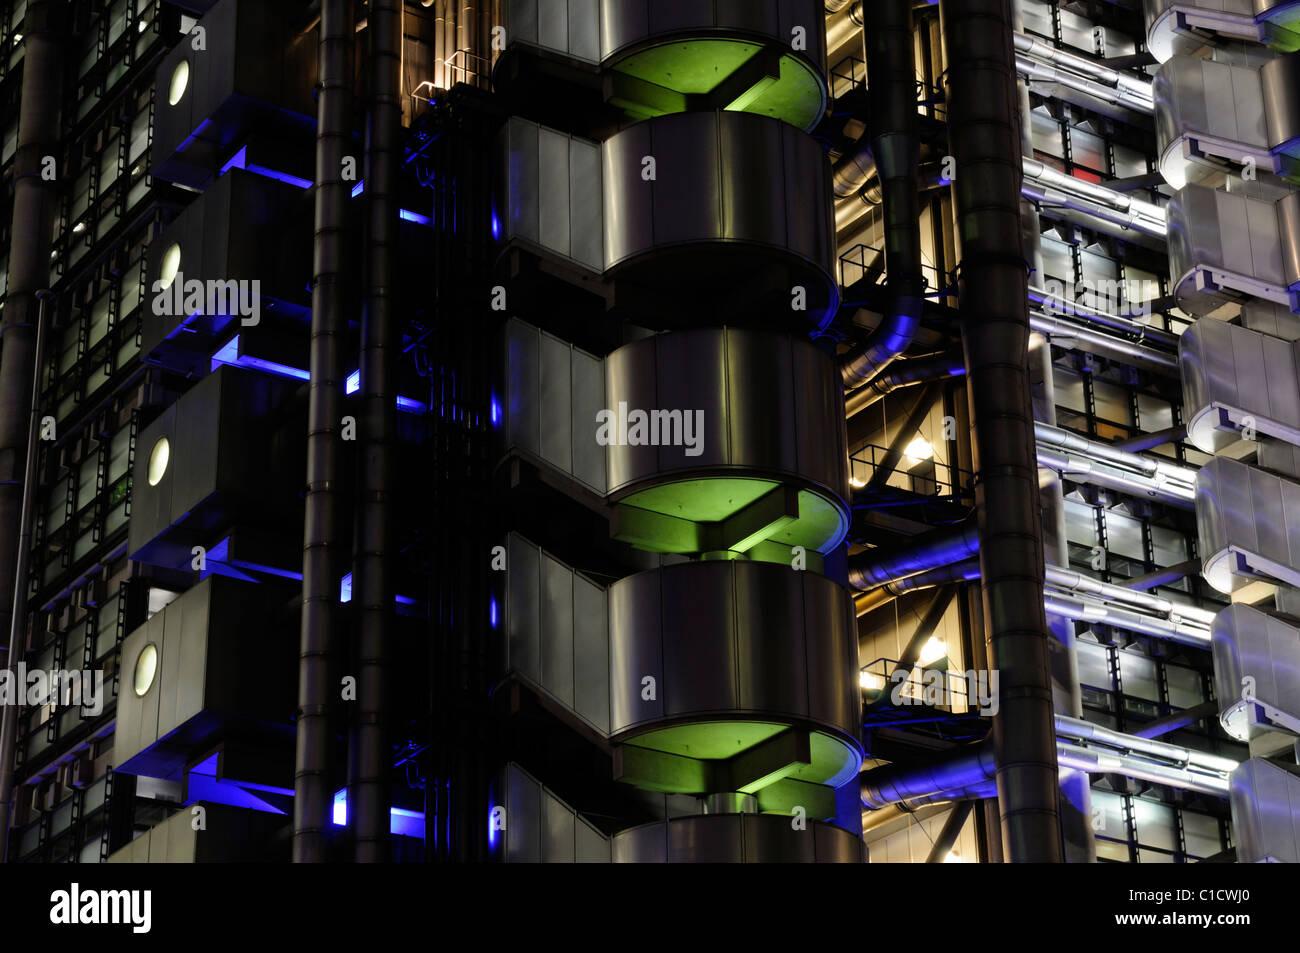 Abstrakte Architekturdetail von Lloyds of London Gebäude, Leadenhall Street, London, England, UK Stockbild